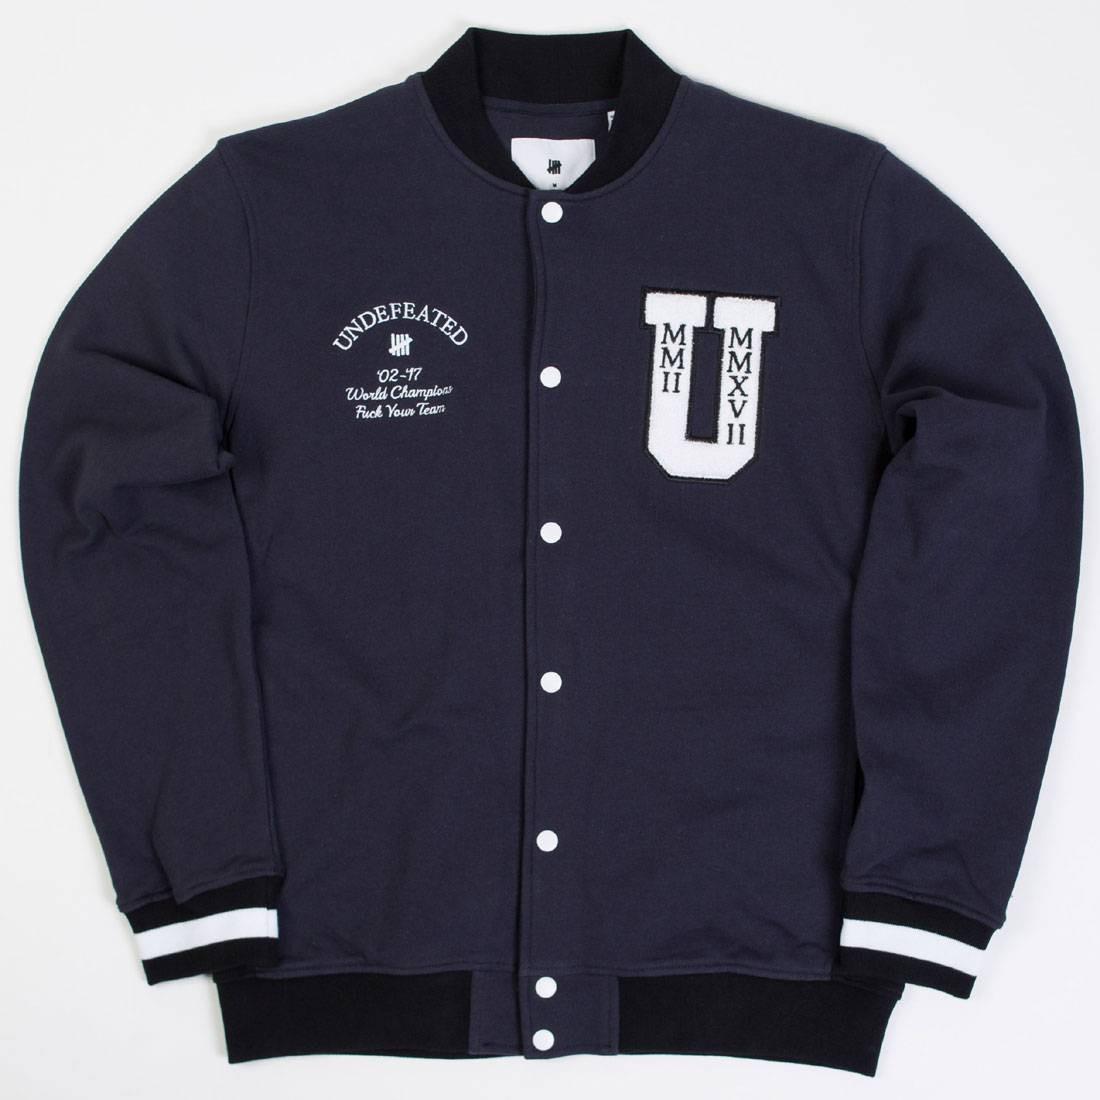 UNDEFEATED フリース メンズファッション コート ジャケット メンズ 【 Men Fleece Varsity Jacket (navy) 】 Navy